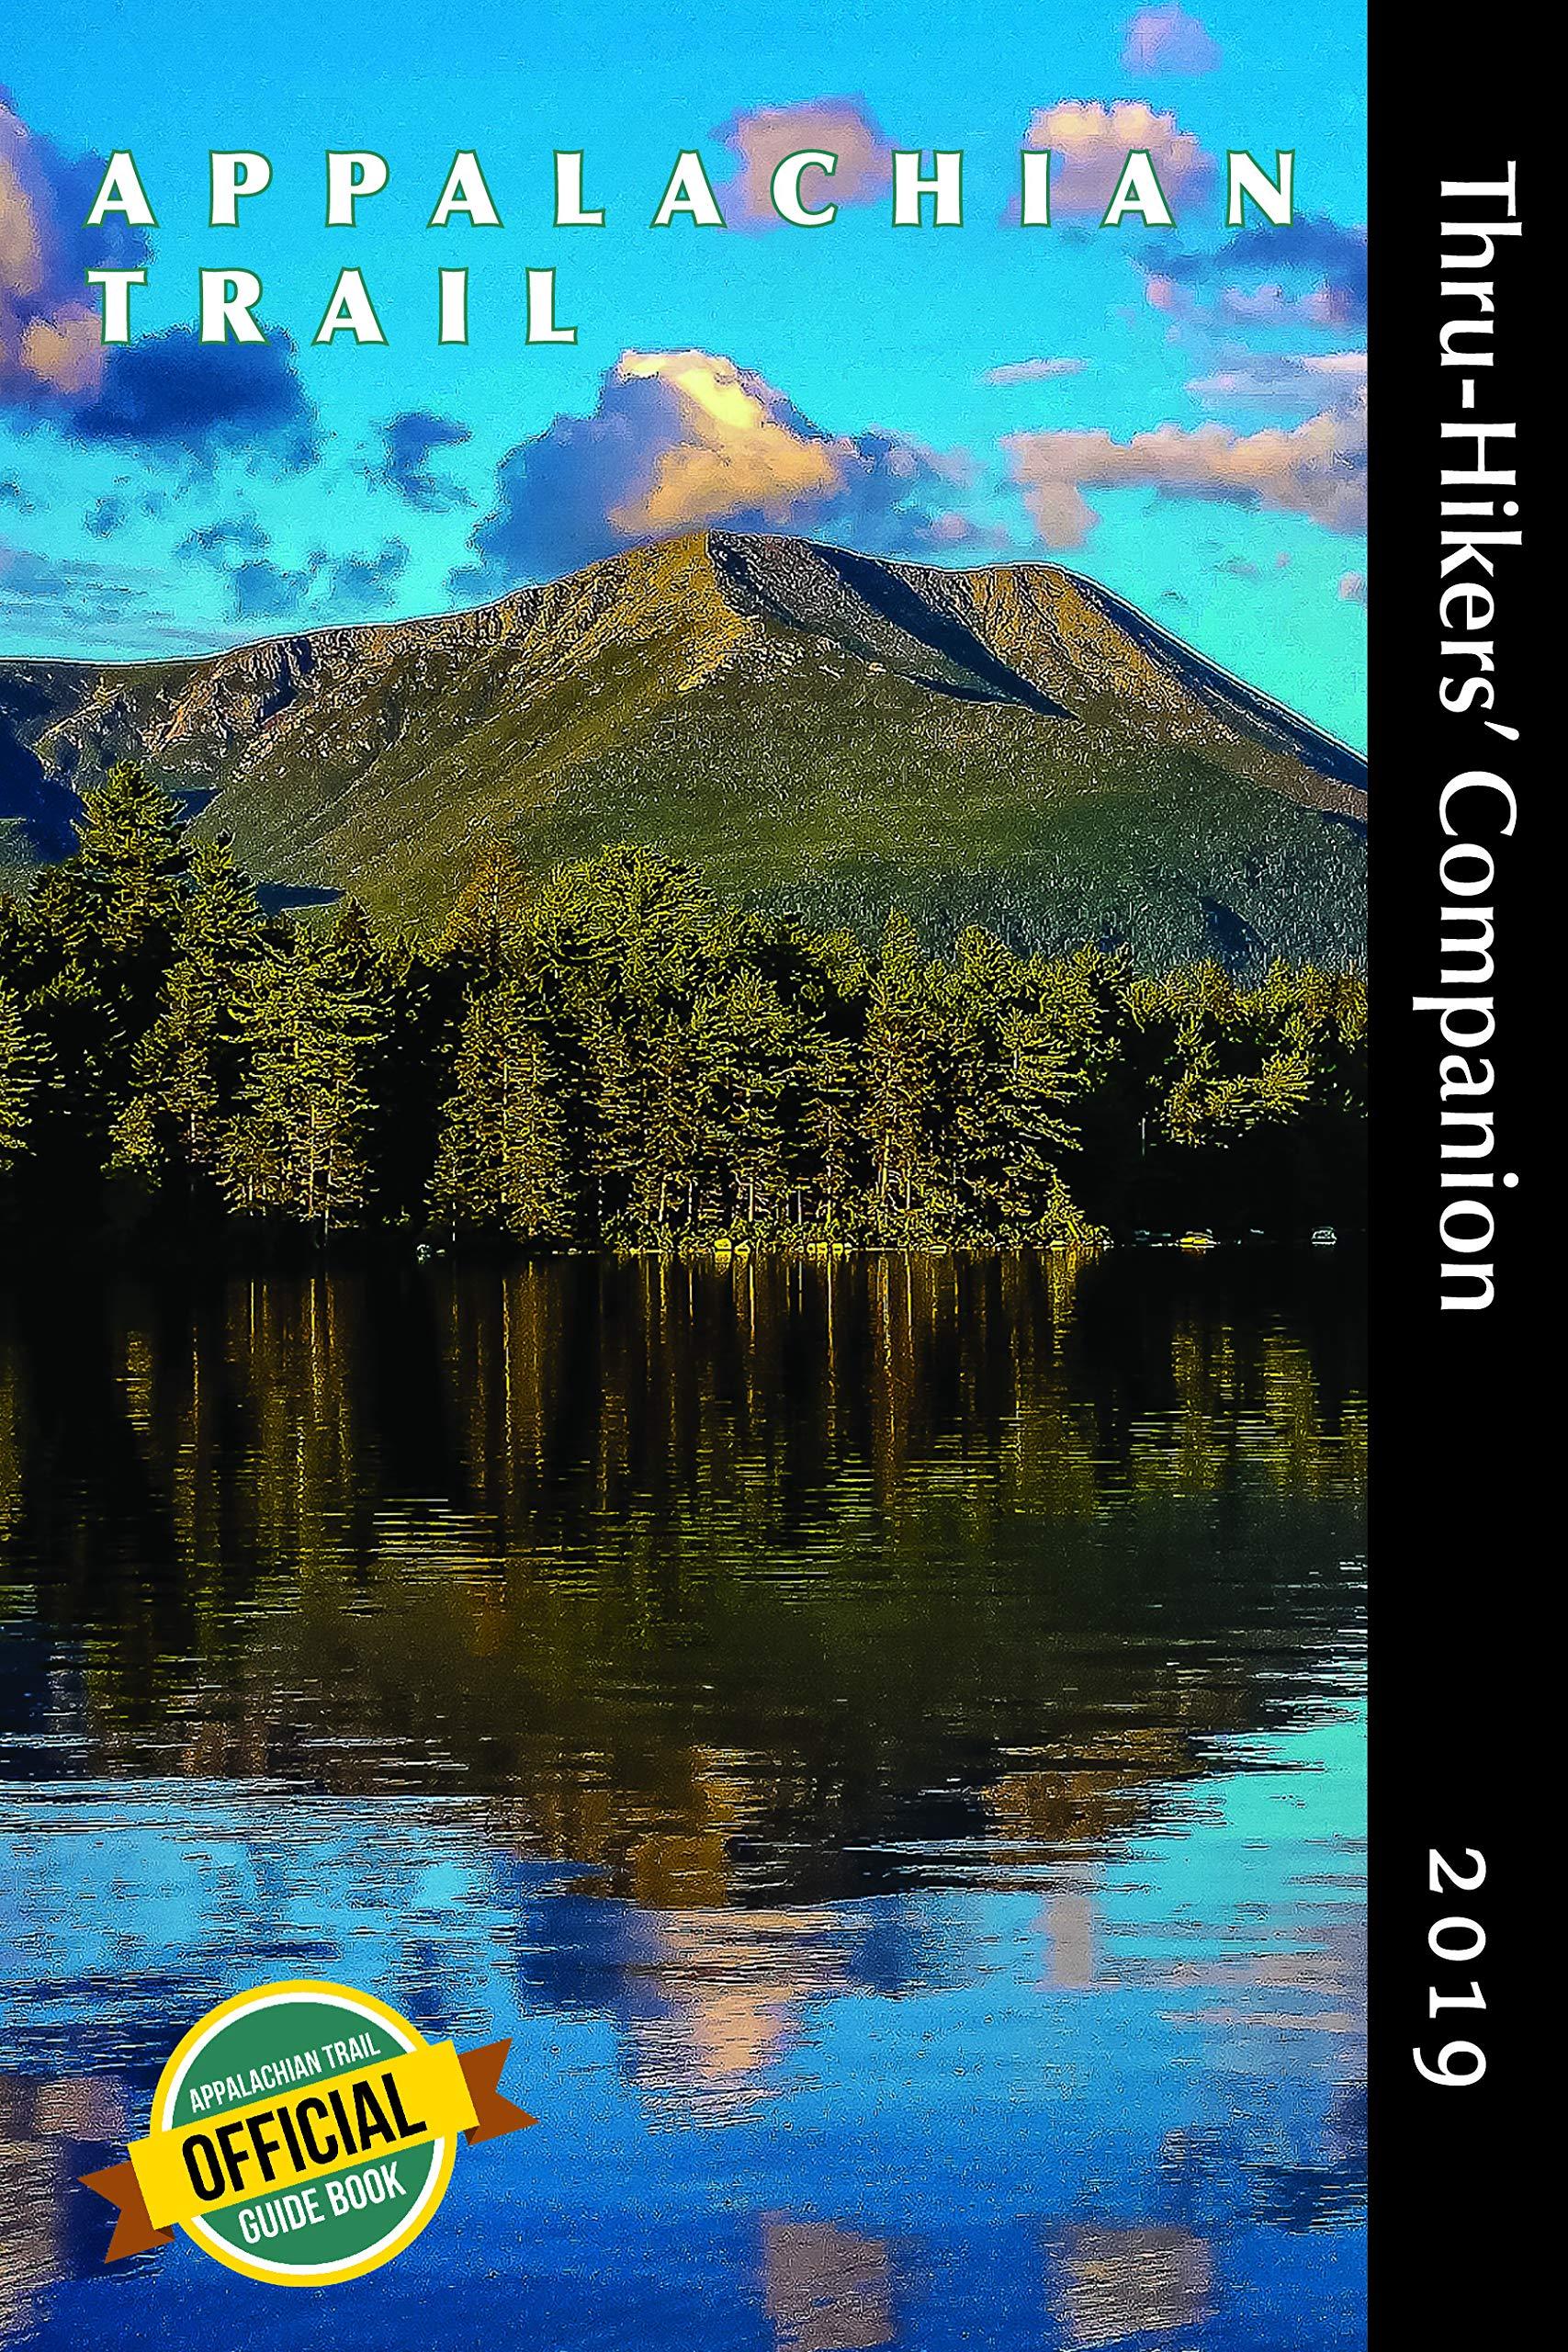 Appalachian Trail Thru-Hiker's Companion (2019) by Appalachian Trail Conservancy